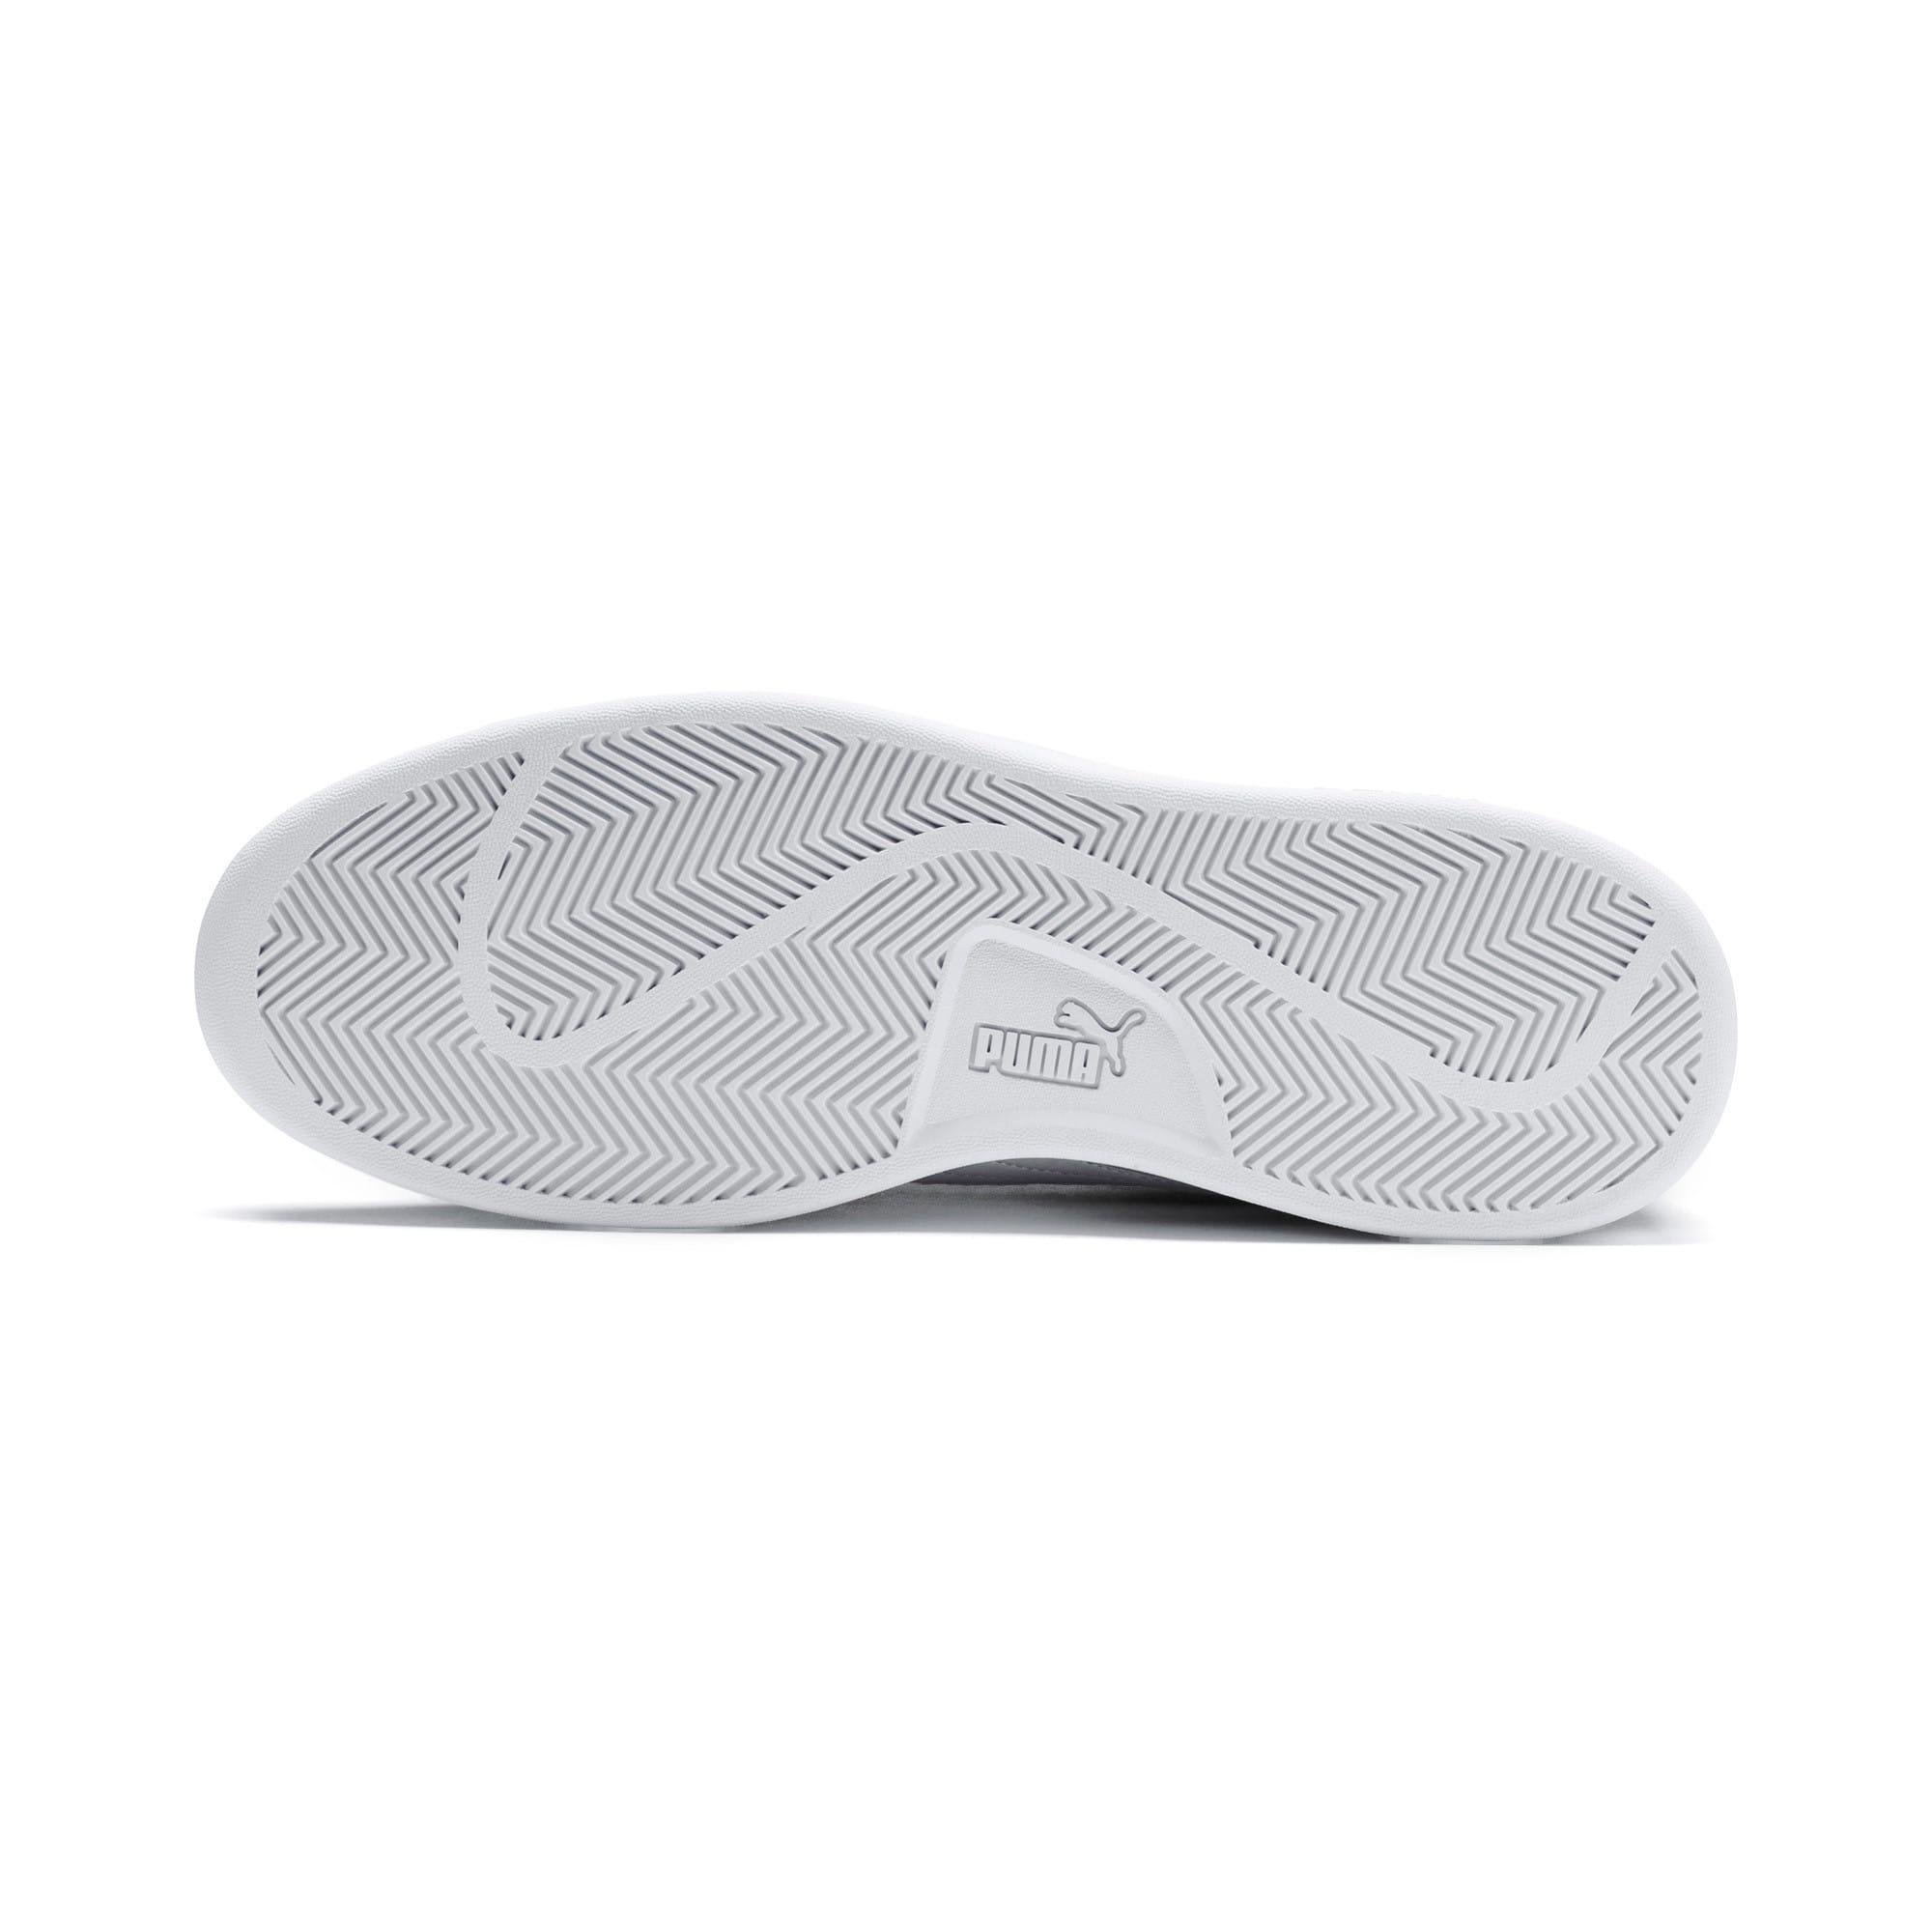 Thumbnail 4 of PUMA Smash v2 Sneakers, Charcoal Gray-Puma White, medium-IND